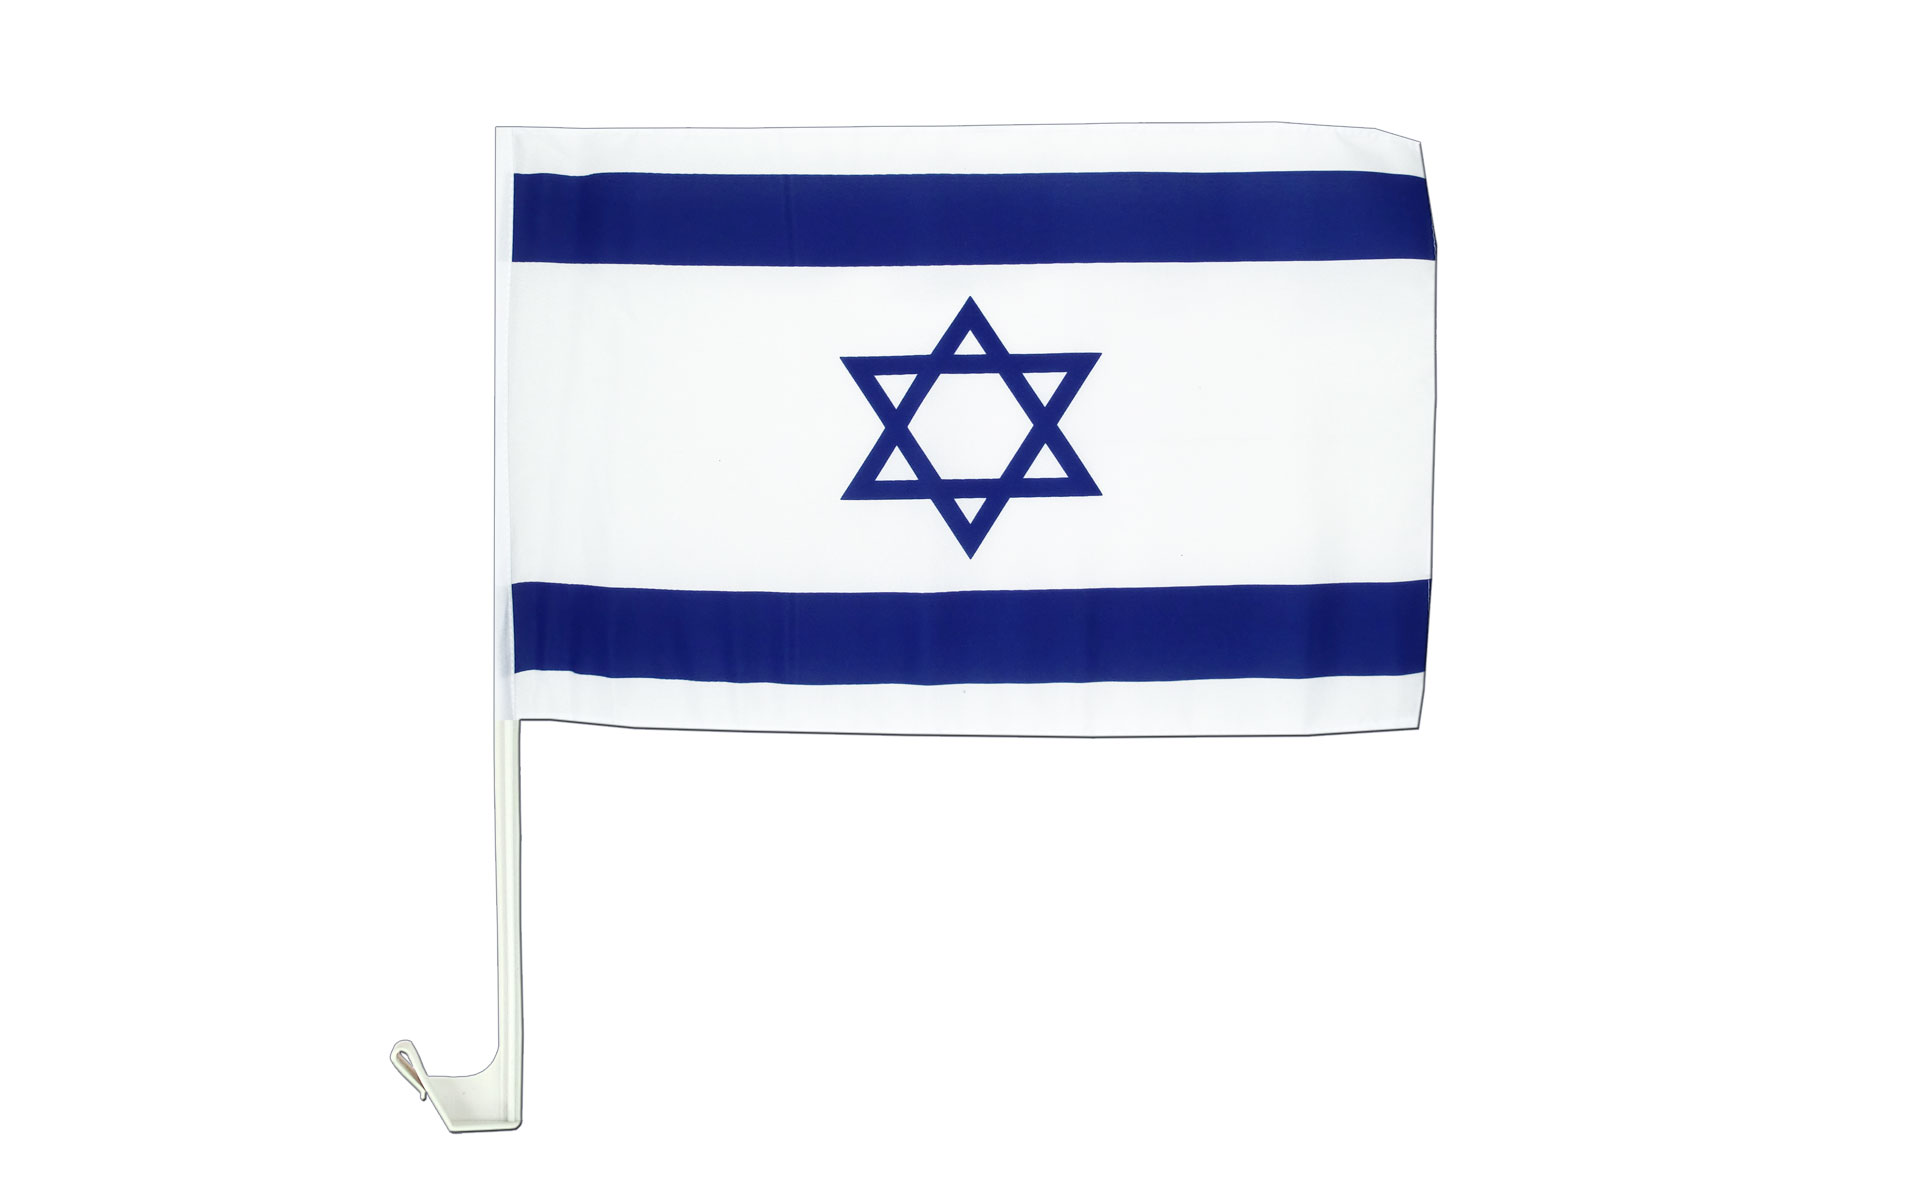 israel autoflagge autofahne 30 x 40 cm flaggenplatz online shop. Black Bedroom Furniture Sets. Home Design Ideas